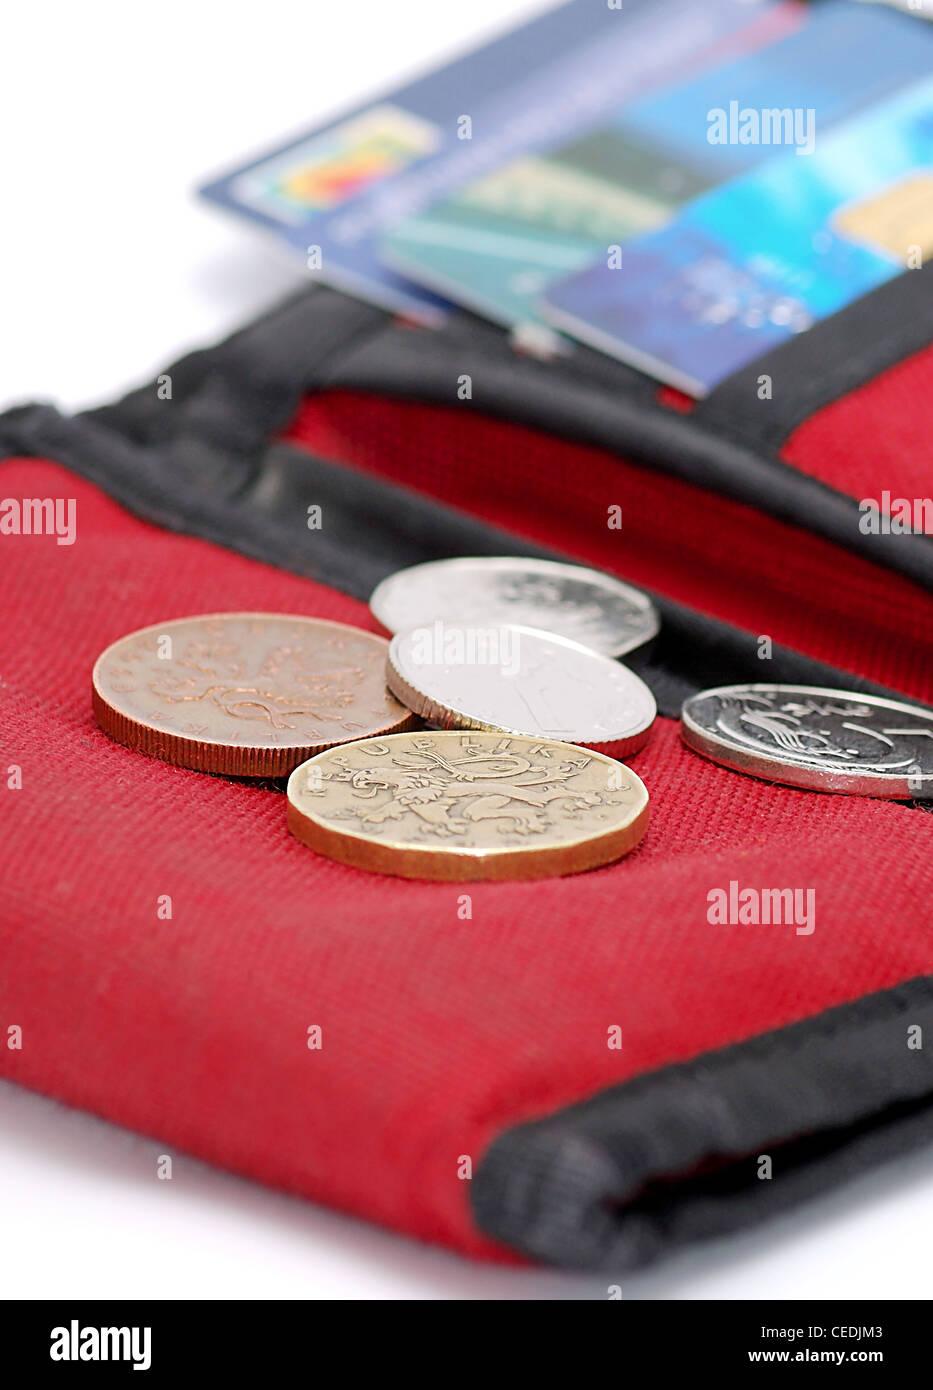 Rote Geldbörse Stockfotos Rote Geldbörse Bilder Alamy